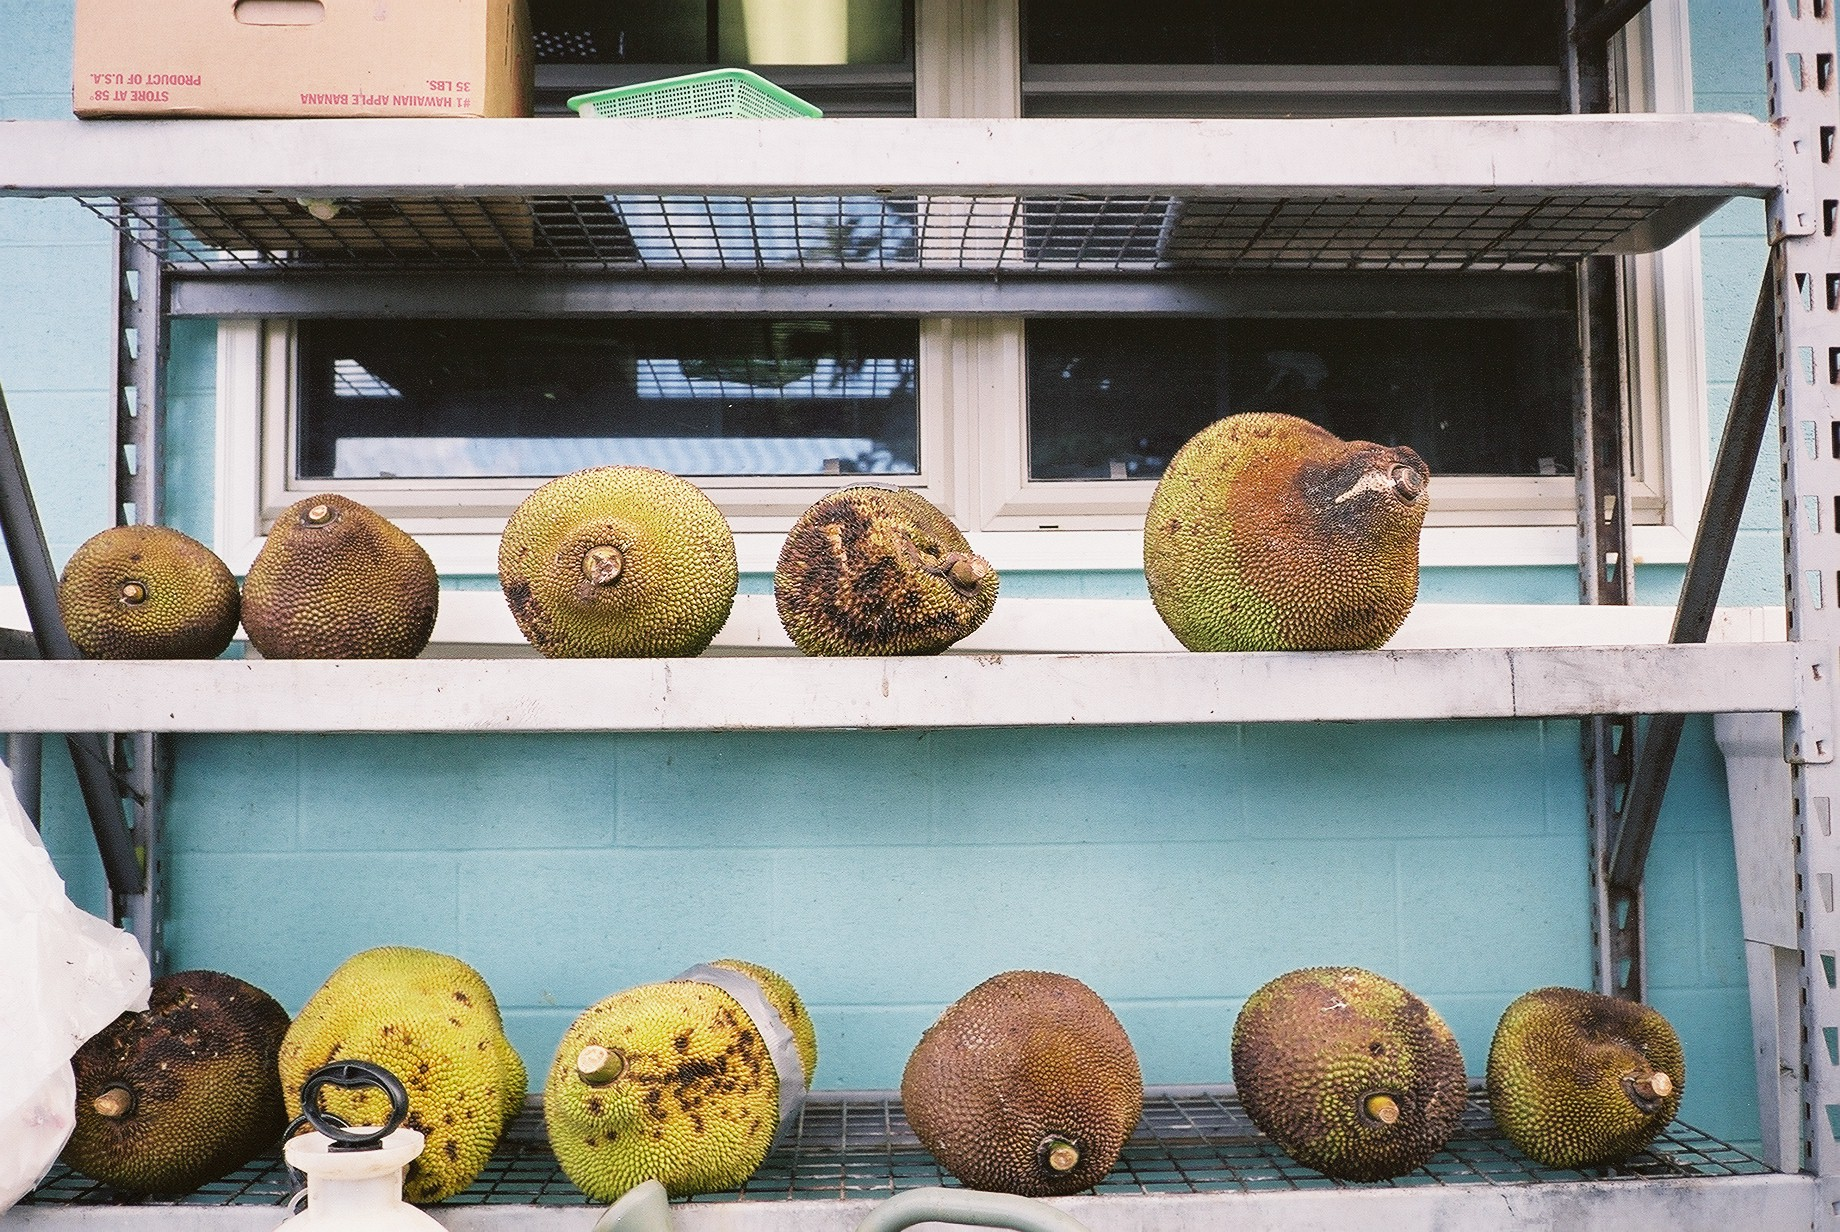 Jackfruit on shelves.